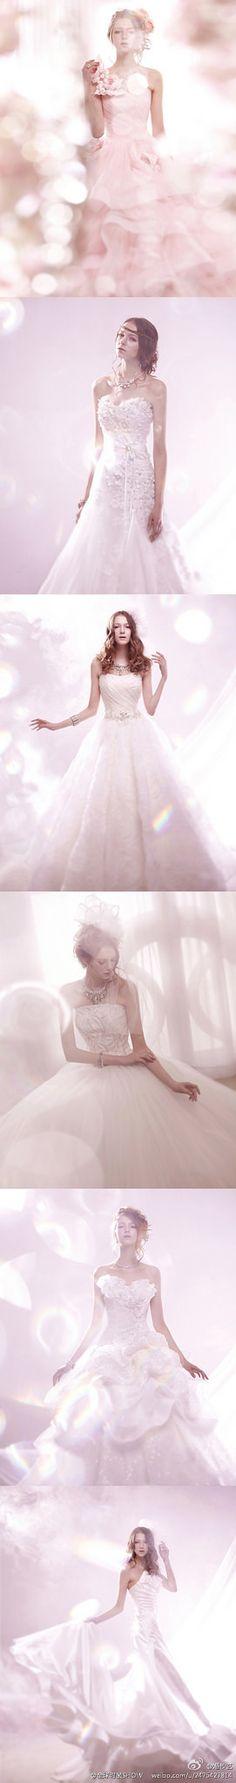 https://flic.kr/p/BDSafJ   Trouwjurken   Wedding Dress, Wedding Dress Lace, Wedding Dress Strapless   www.popo-shoes.nl